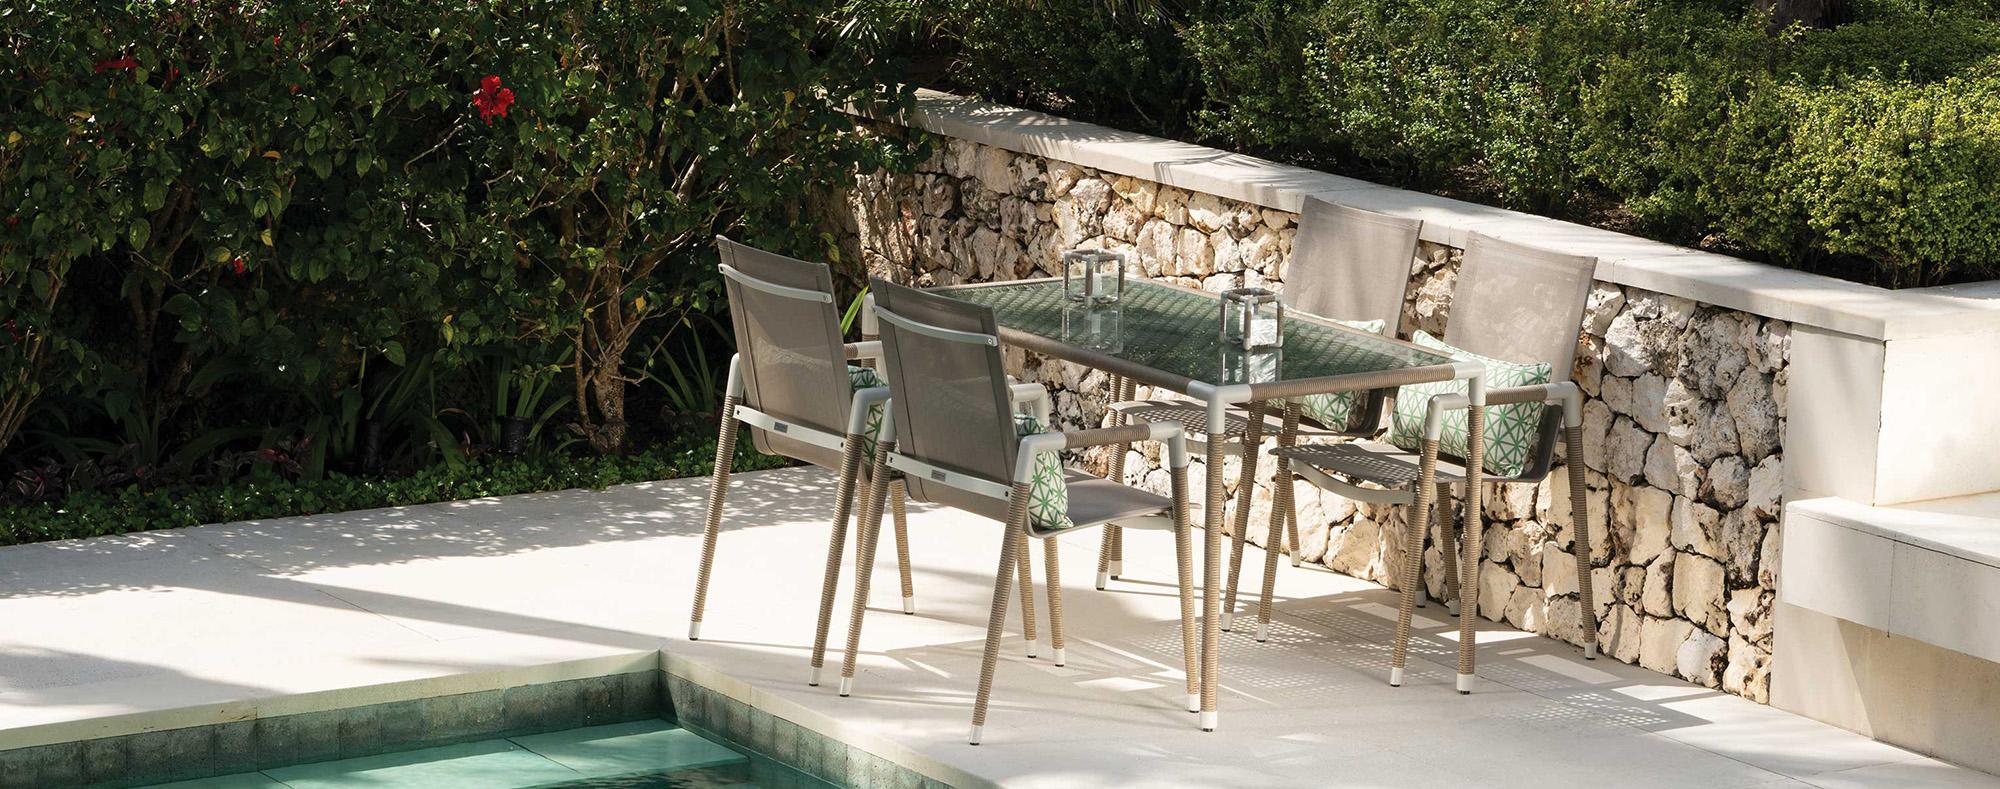 Best Outdoor Dining Furniture for Upmarket Entertaining